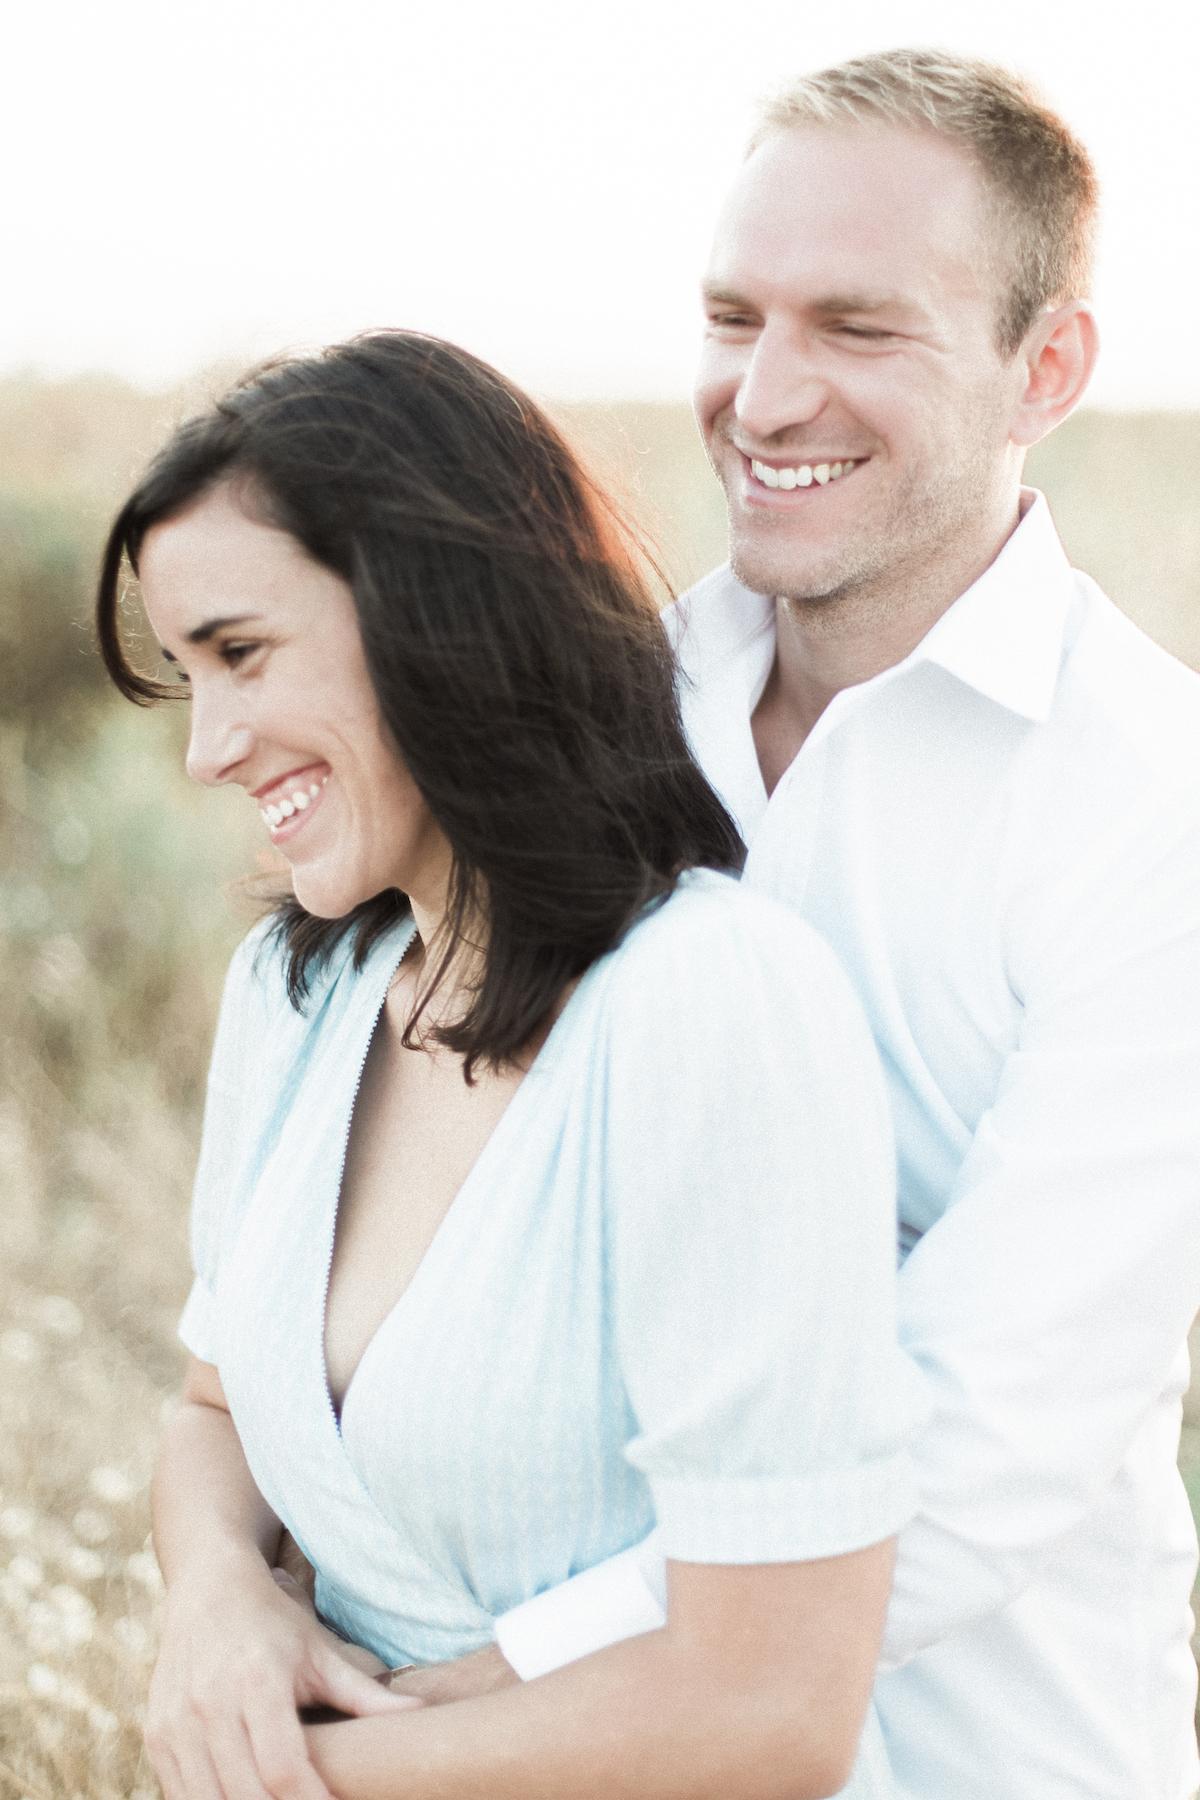 pre-wedding-camargue-france-13.jpg